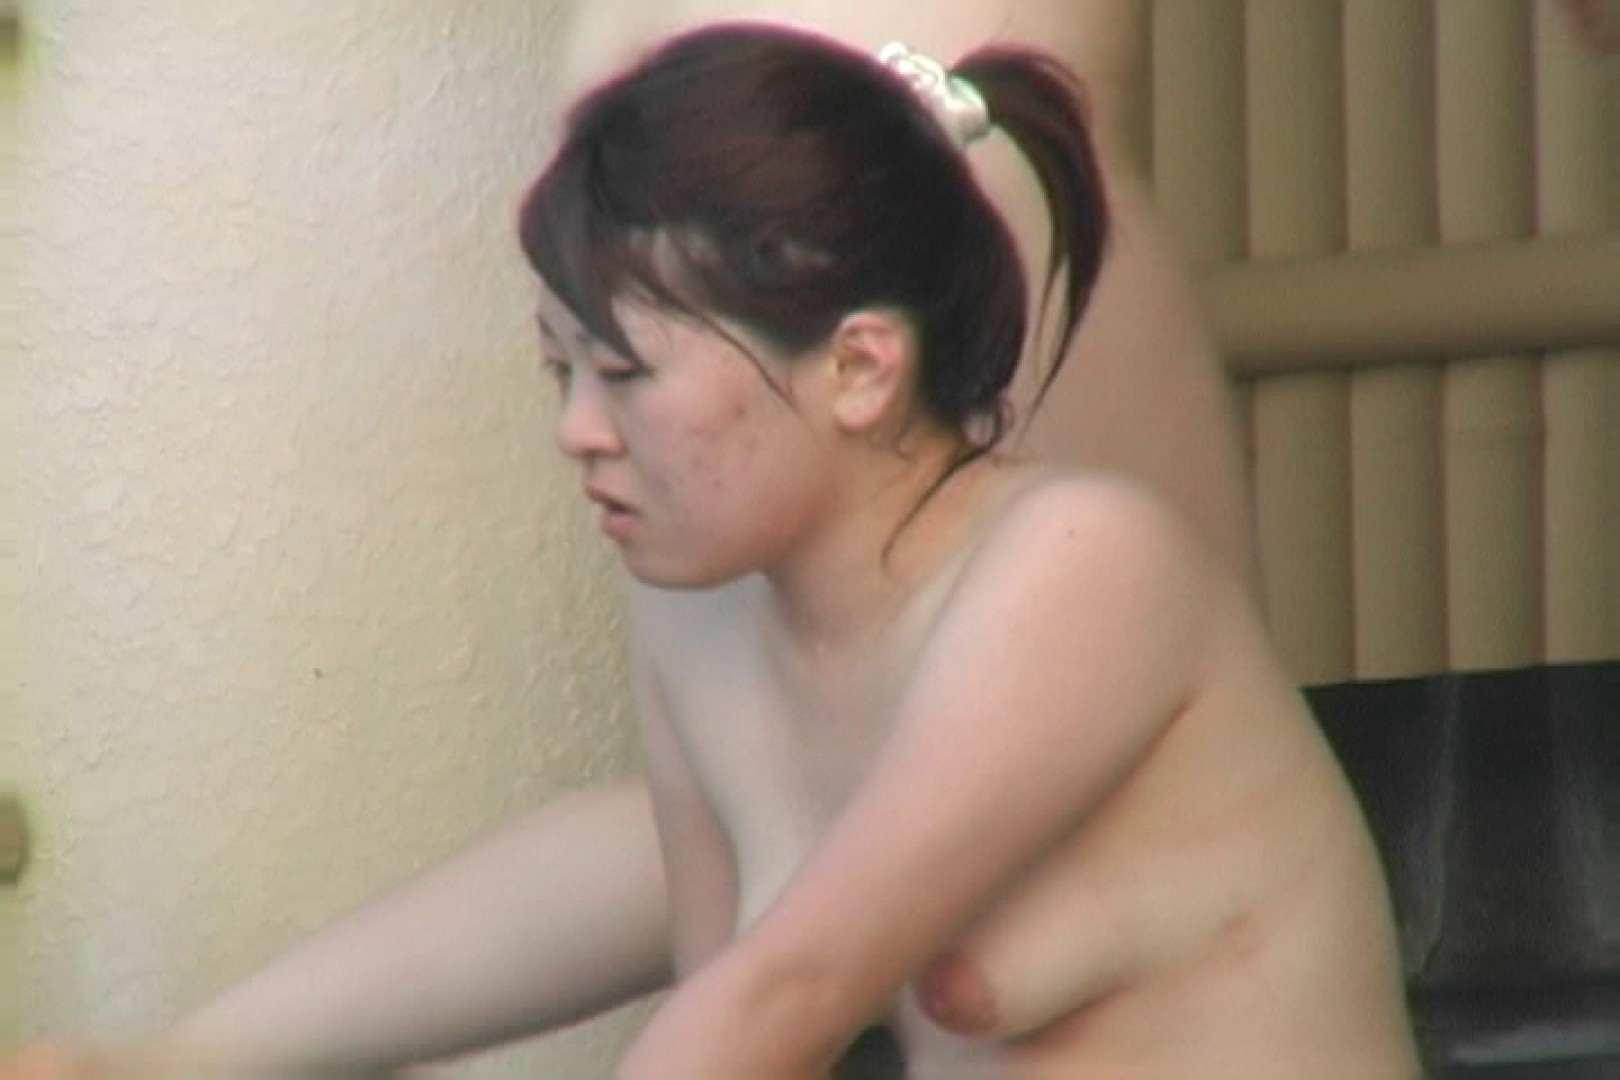 Aquaな露天風呂Vol.115 露天風呂突入   美しいOLの裸体  91pic 31